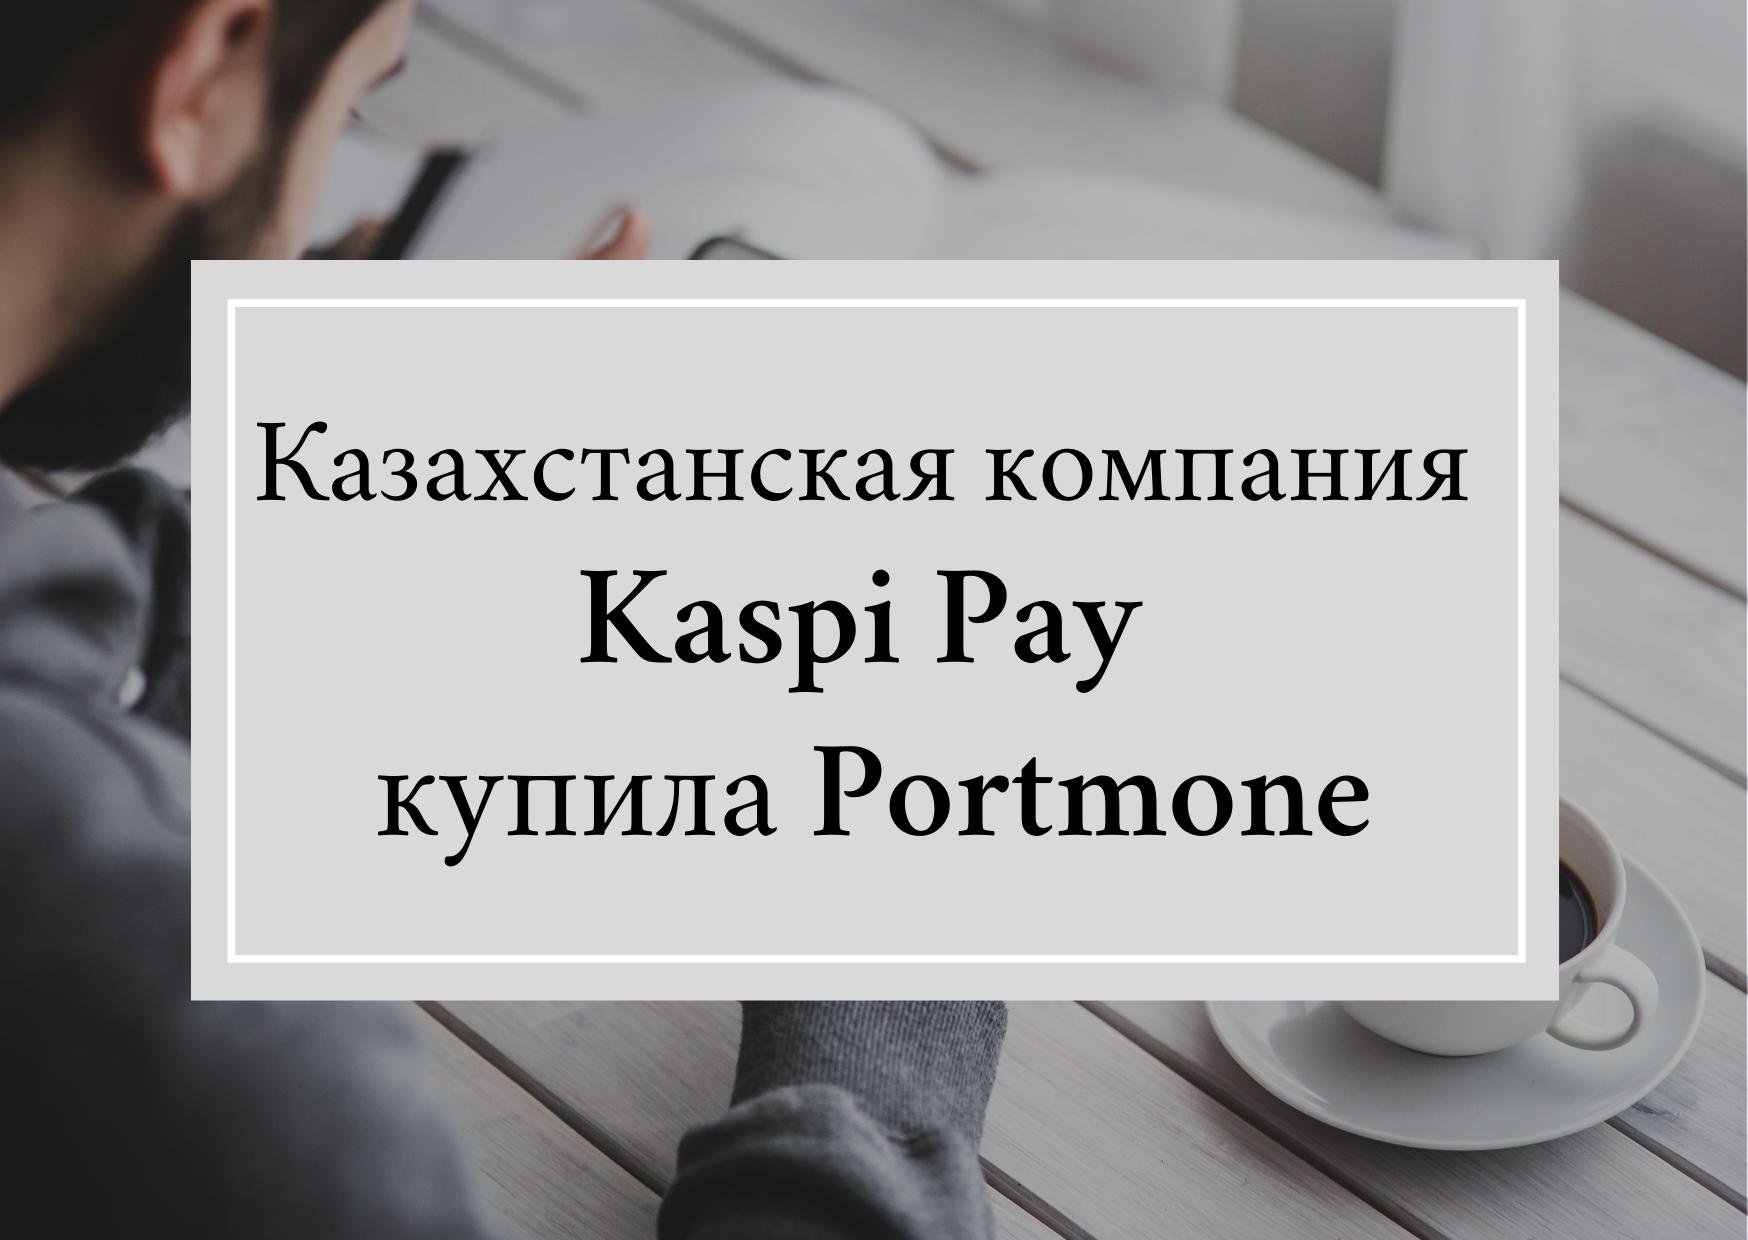 Kaspi Pay купила Portmone